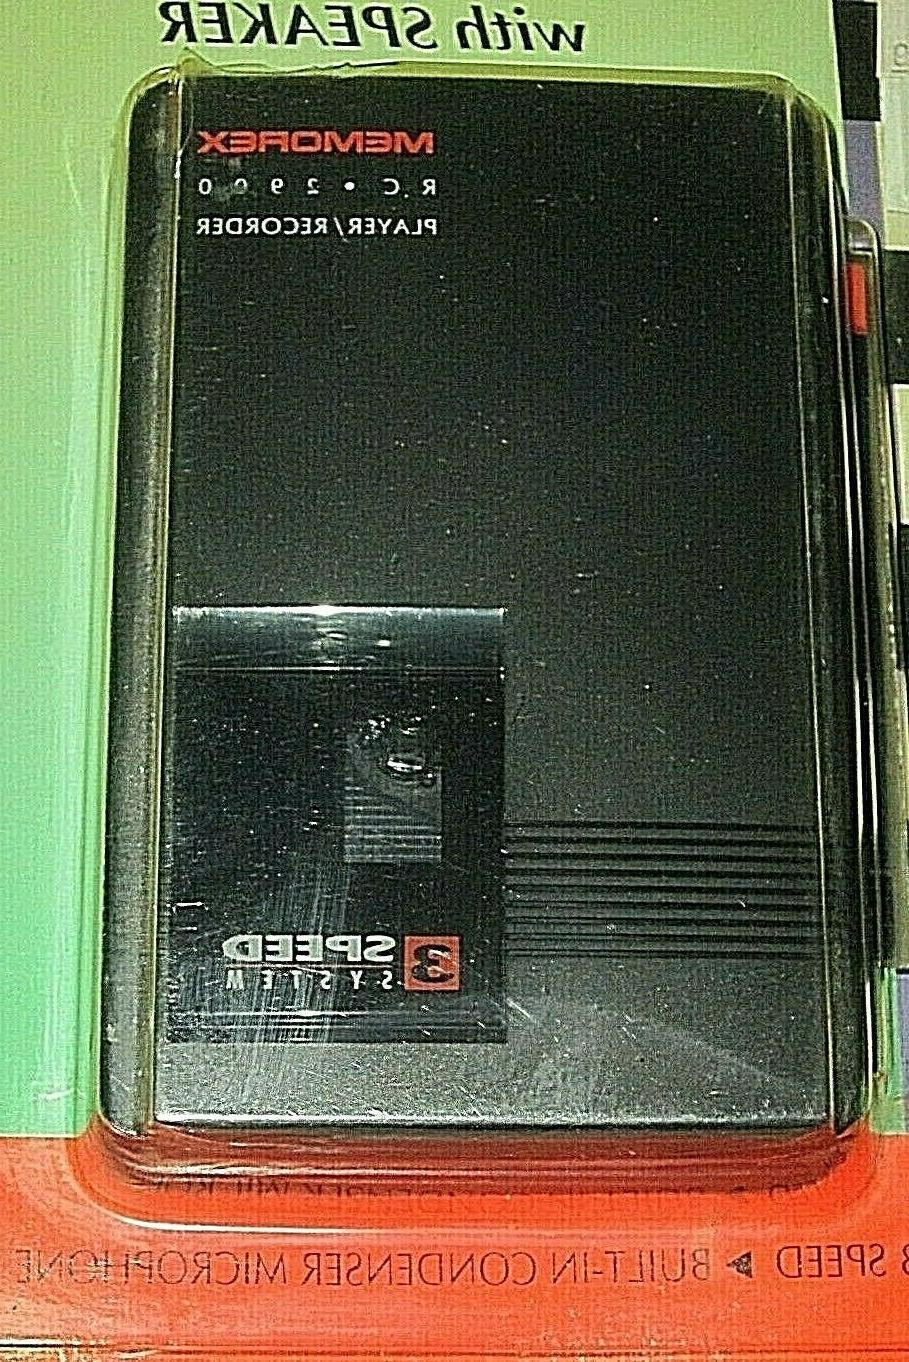 Vintage 1980'S MEMOREX RC2900 MINI PLAYER